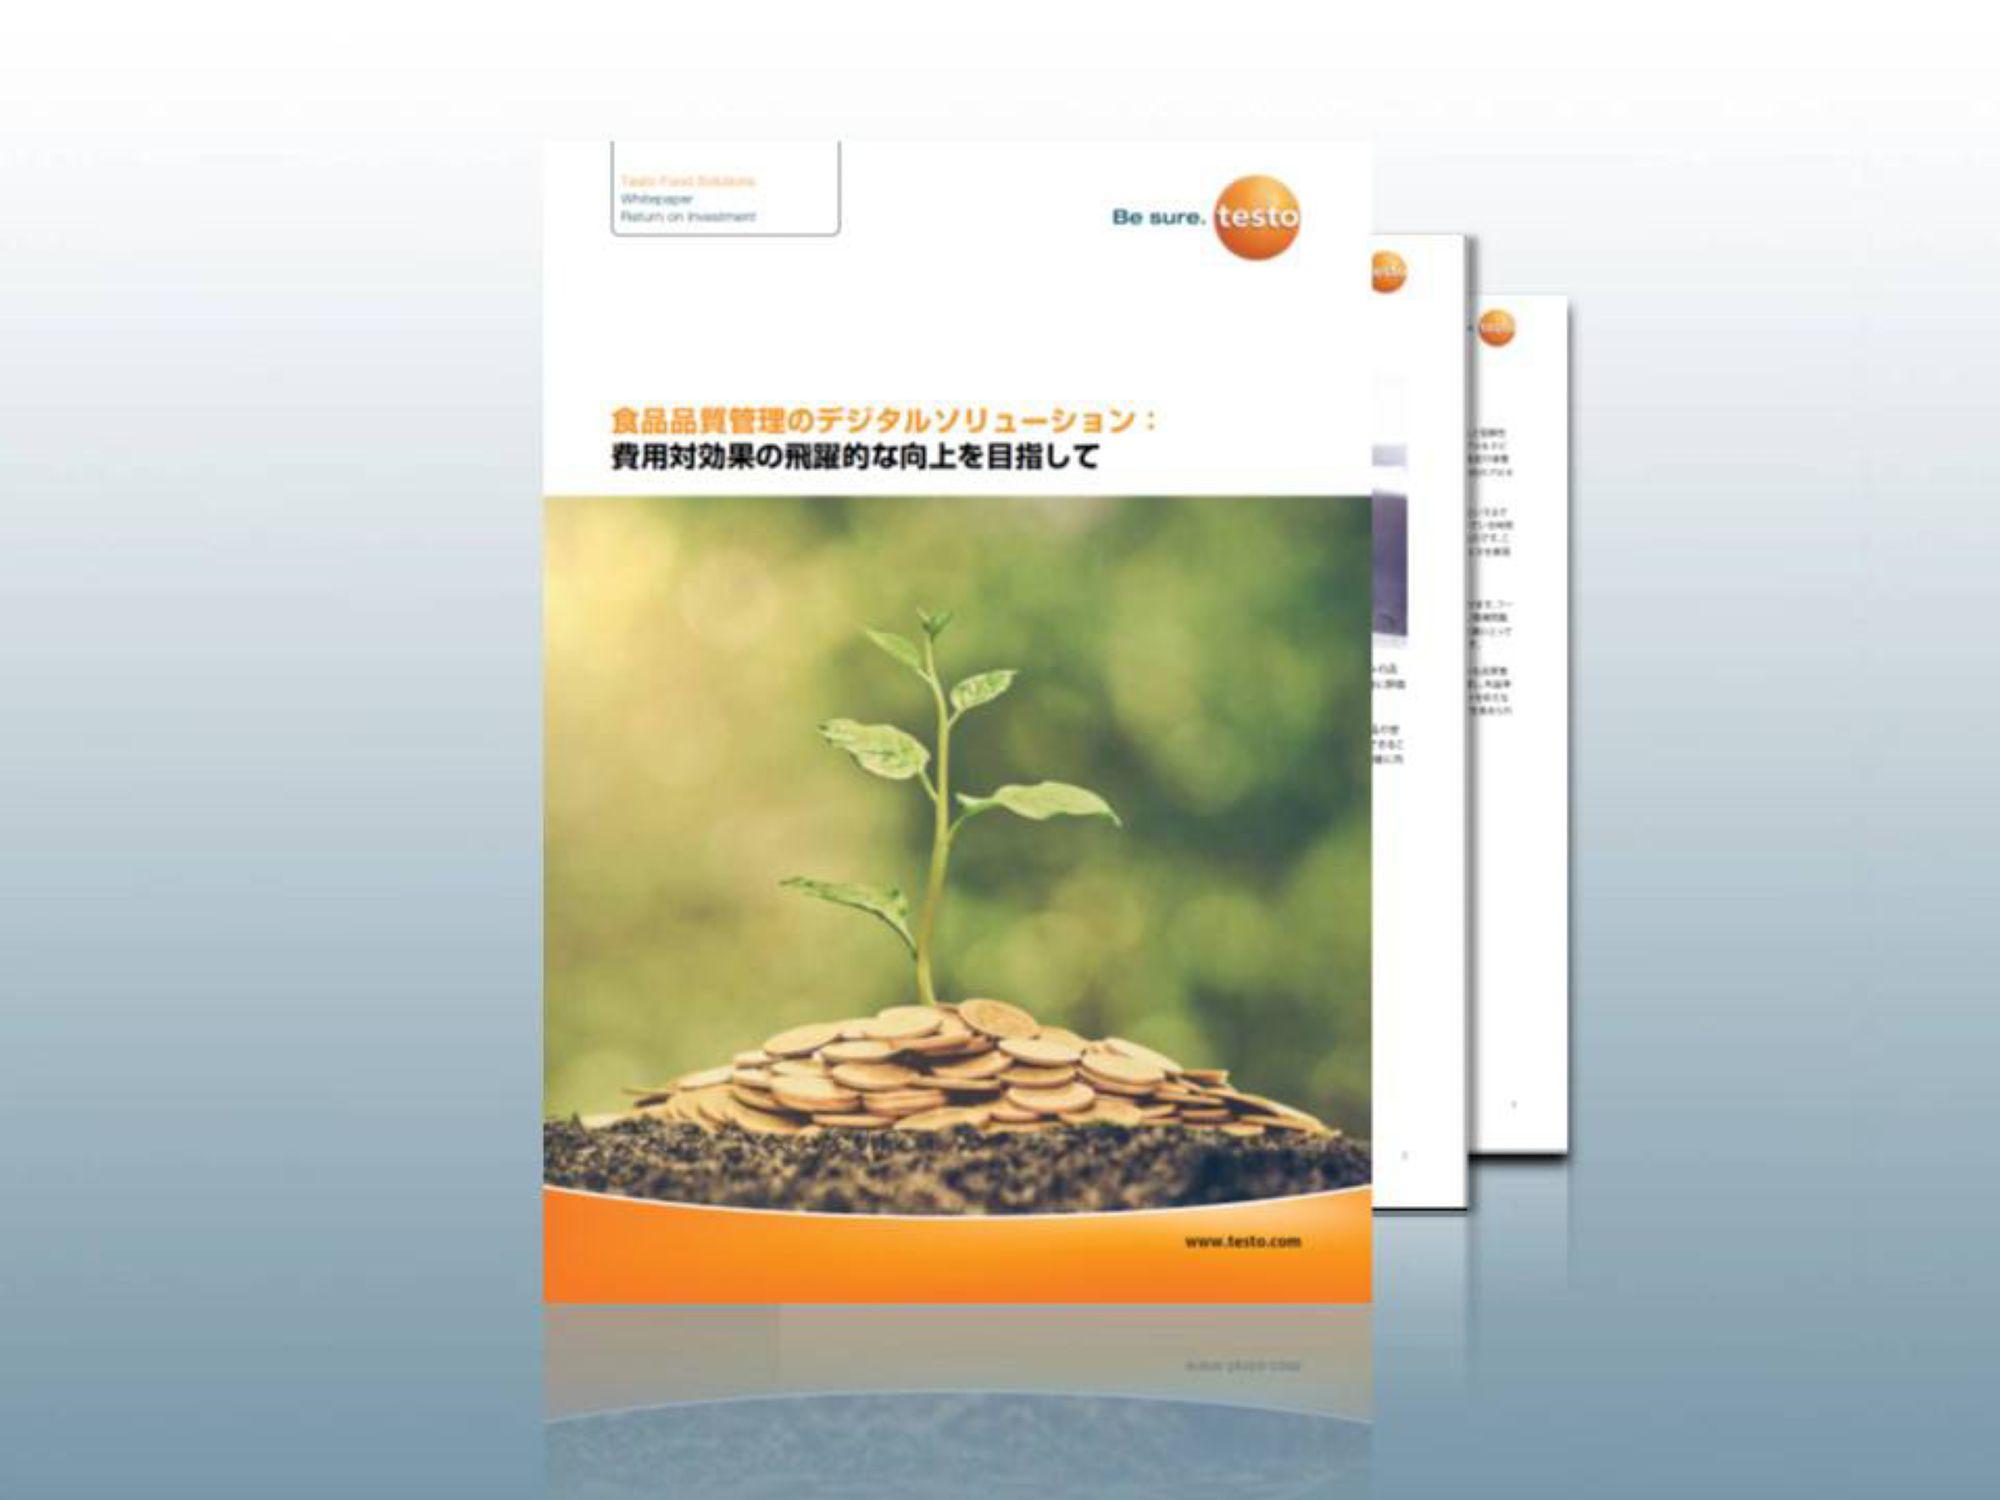 jp_whitepaper-testo-Saveris-Retail-Chains-ROI-thumbnail-JP.JPG